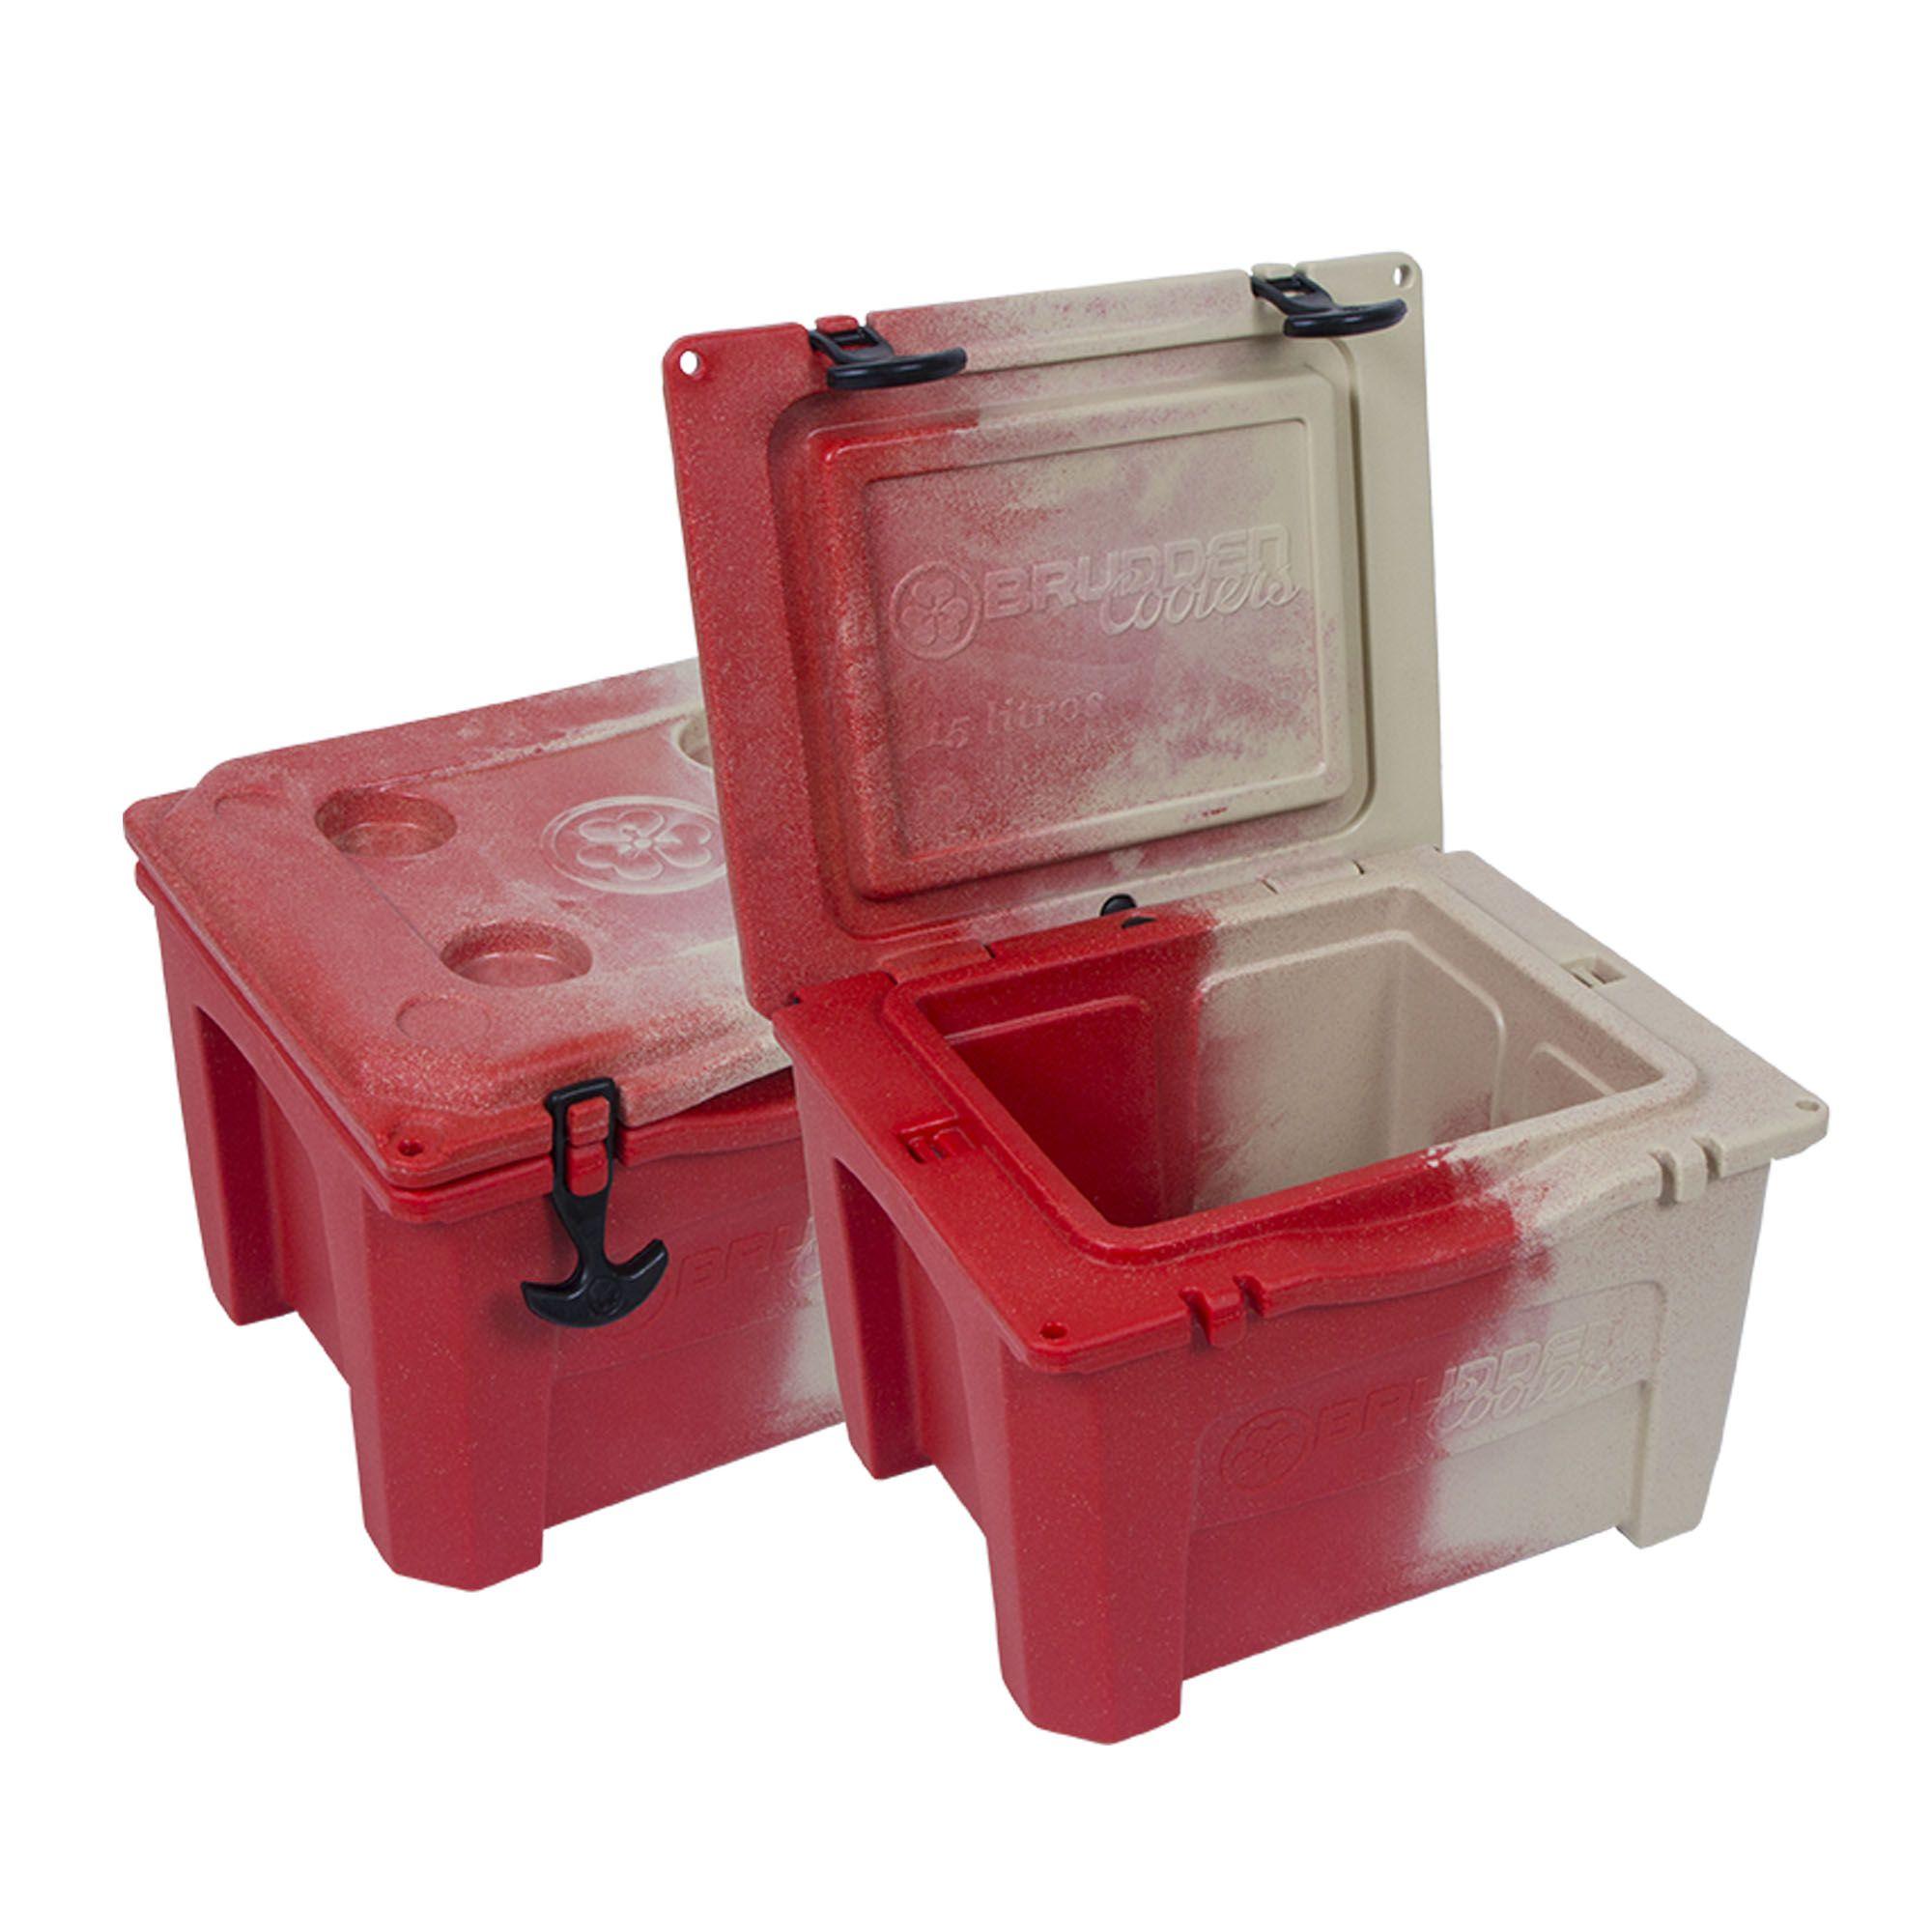 Cooler 15 litros